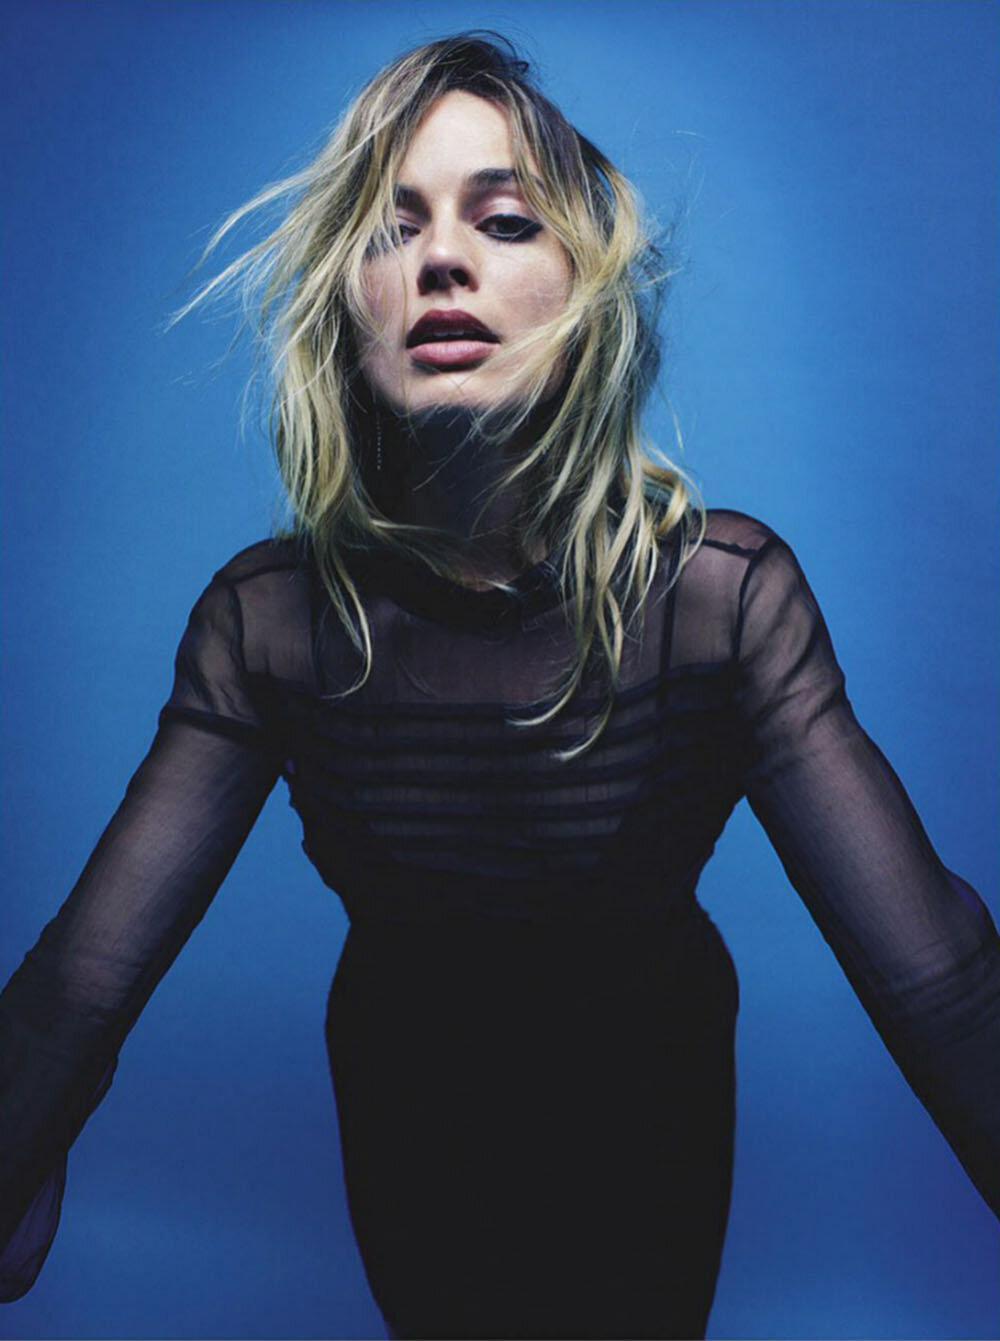 Margot-Robbie-Mario-Sorrenti-Vogue-Australia-September-2019- (7).jpg